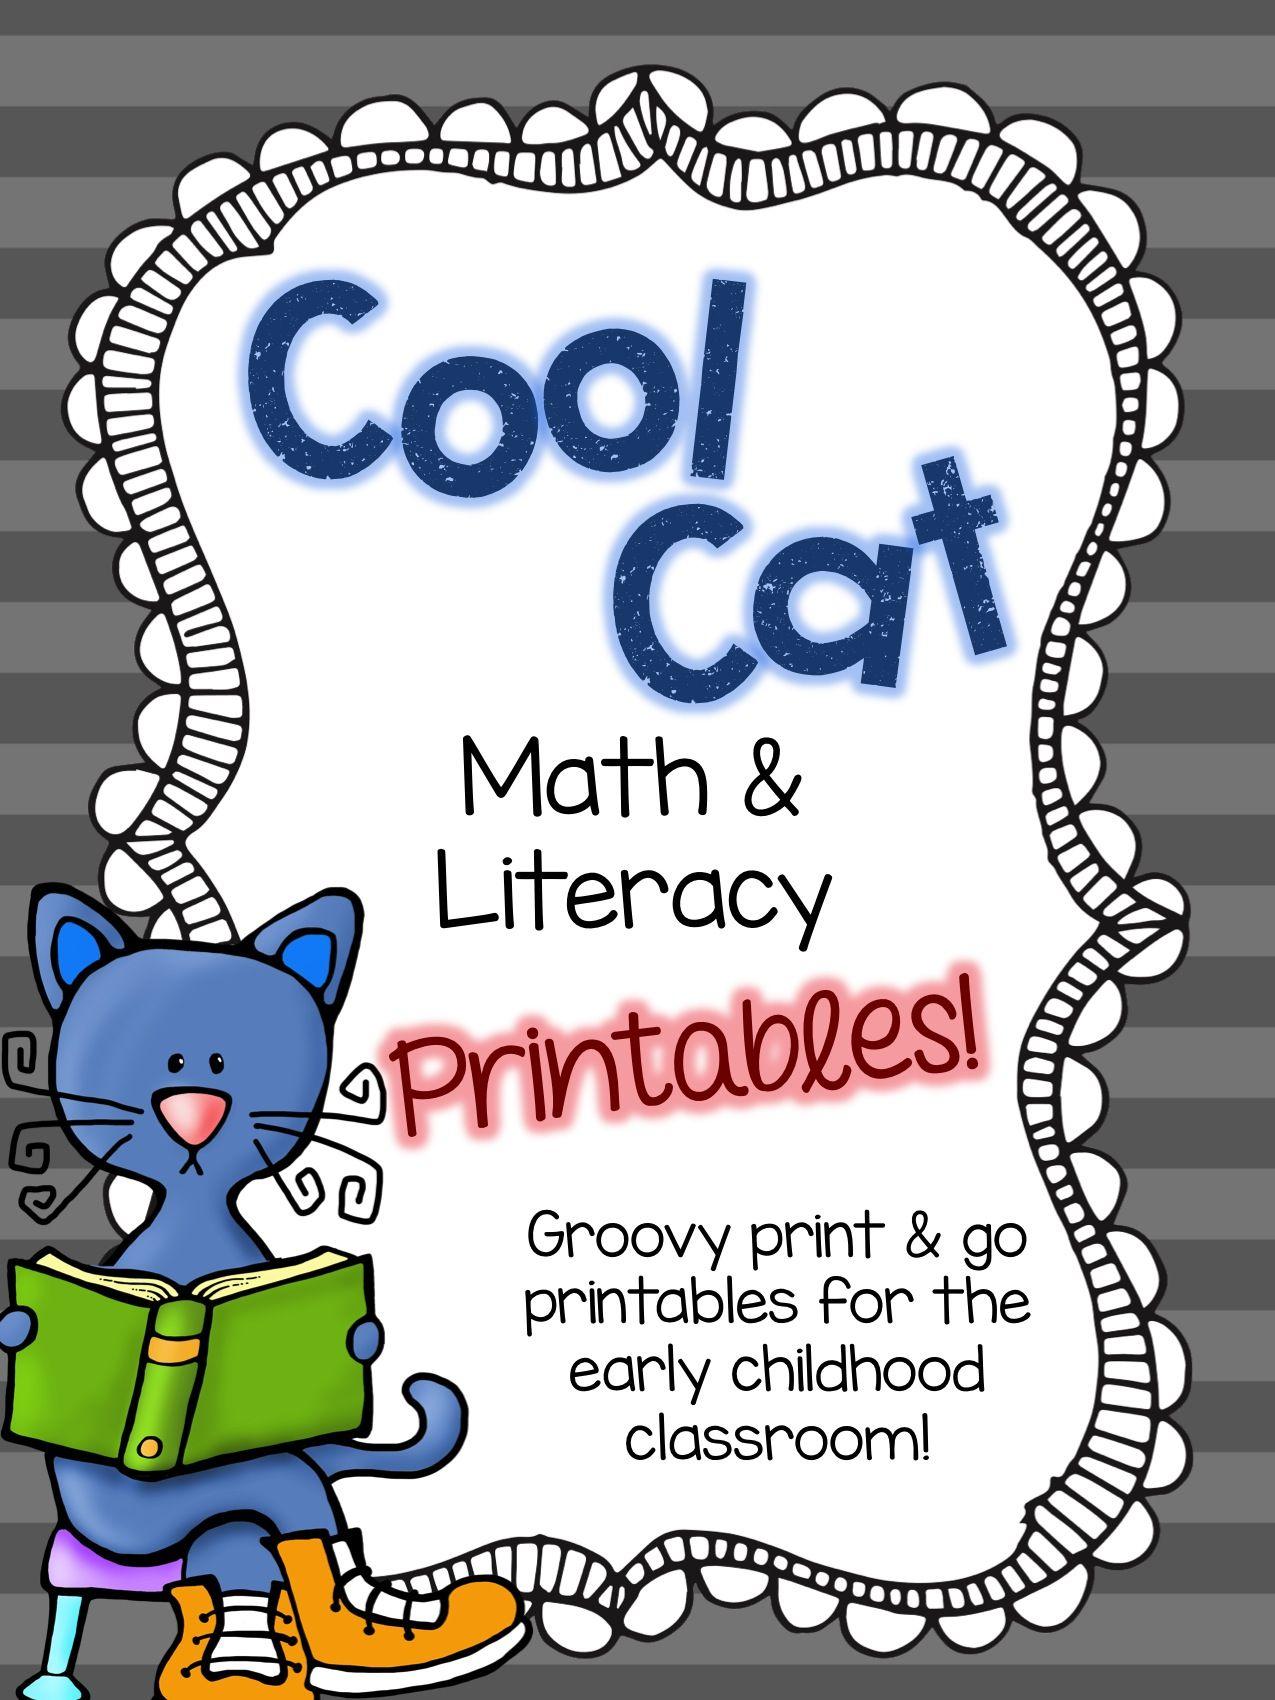 Cool Cat Math Amp Literacy Printables